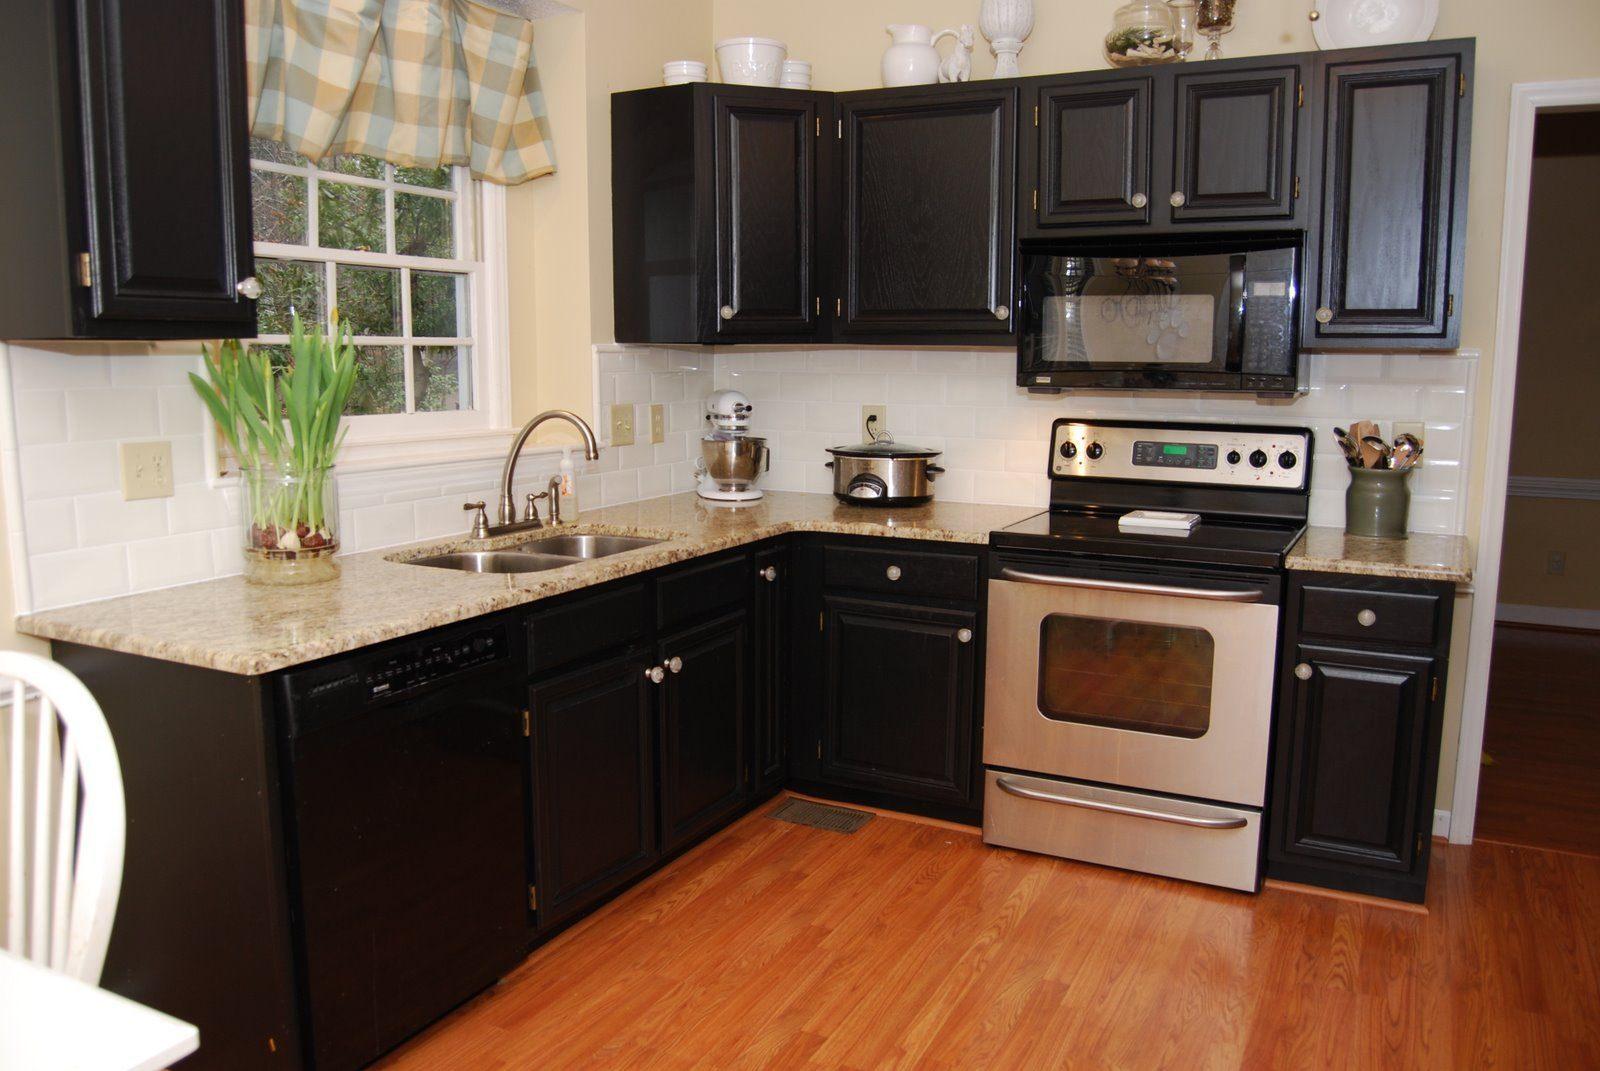 Comprar Muebles Cocina Baratos. Affordable Best Beautiful Comprar ...